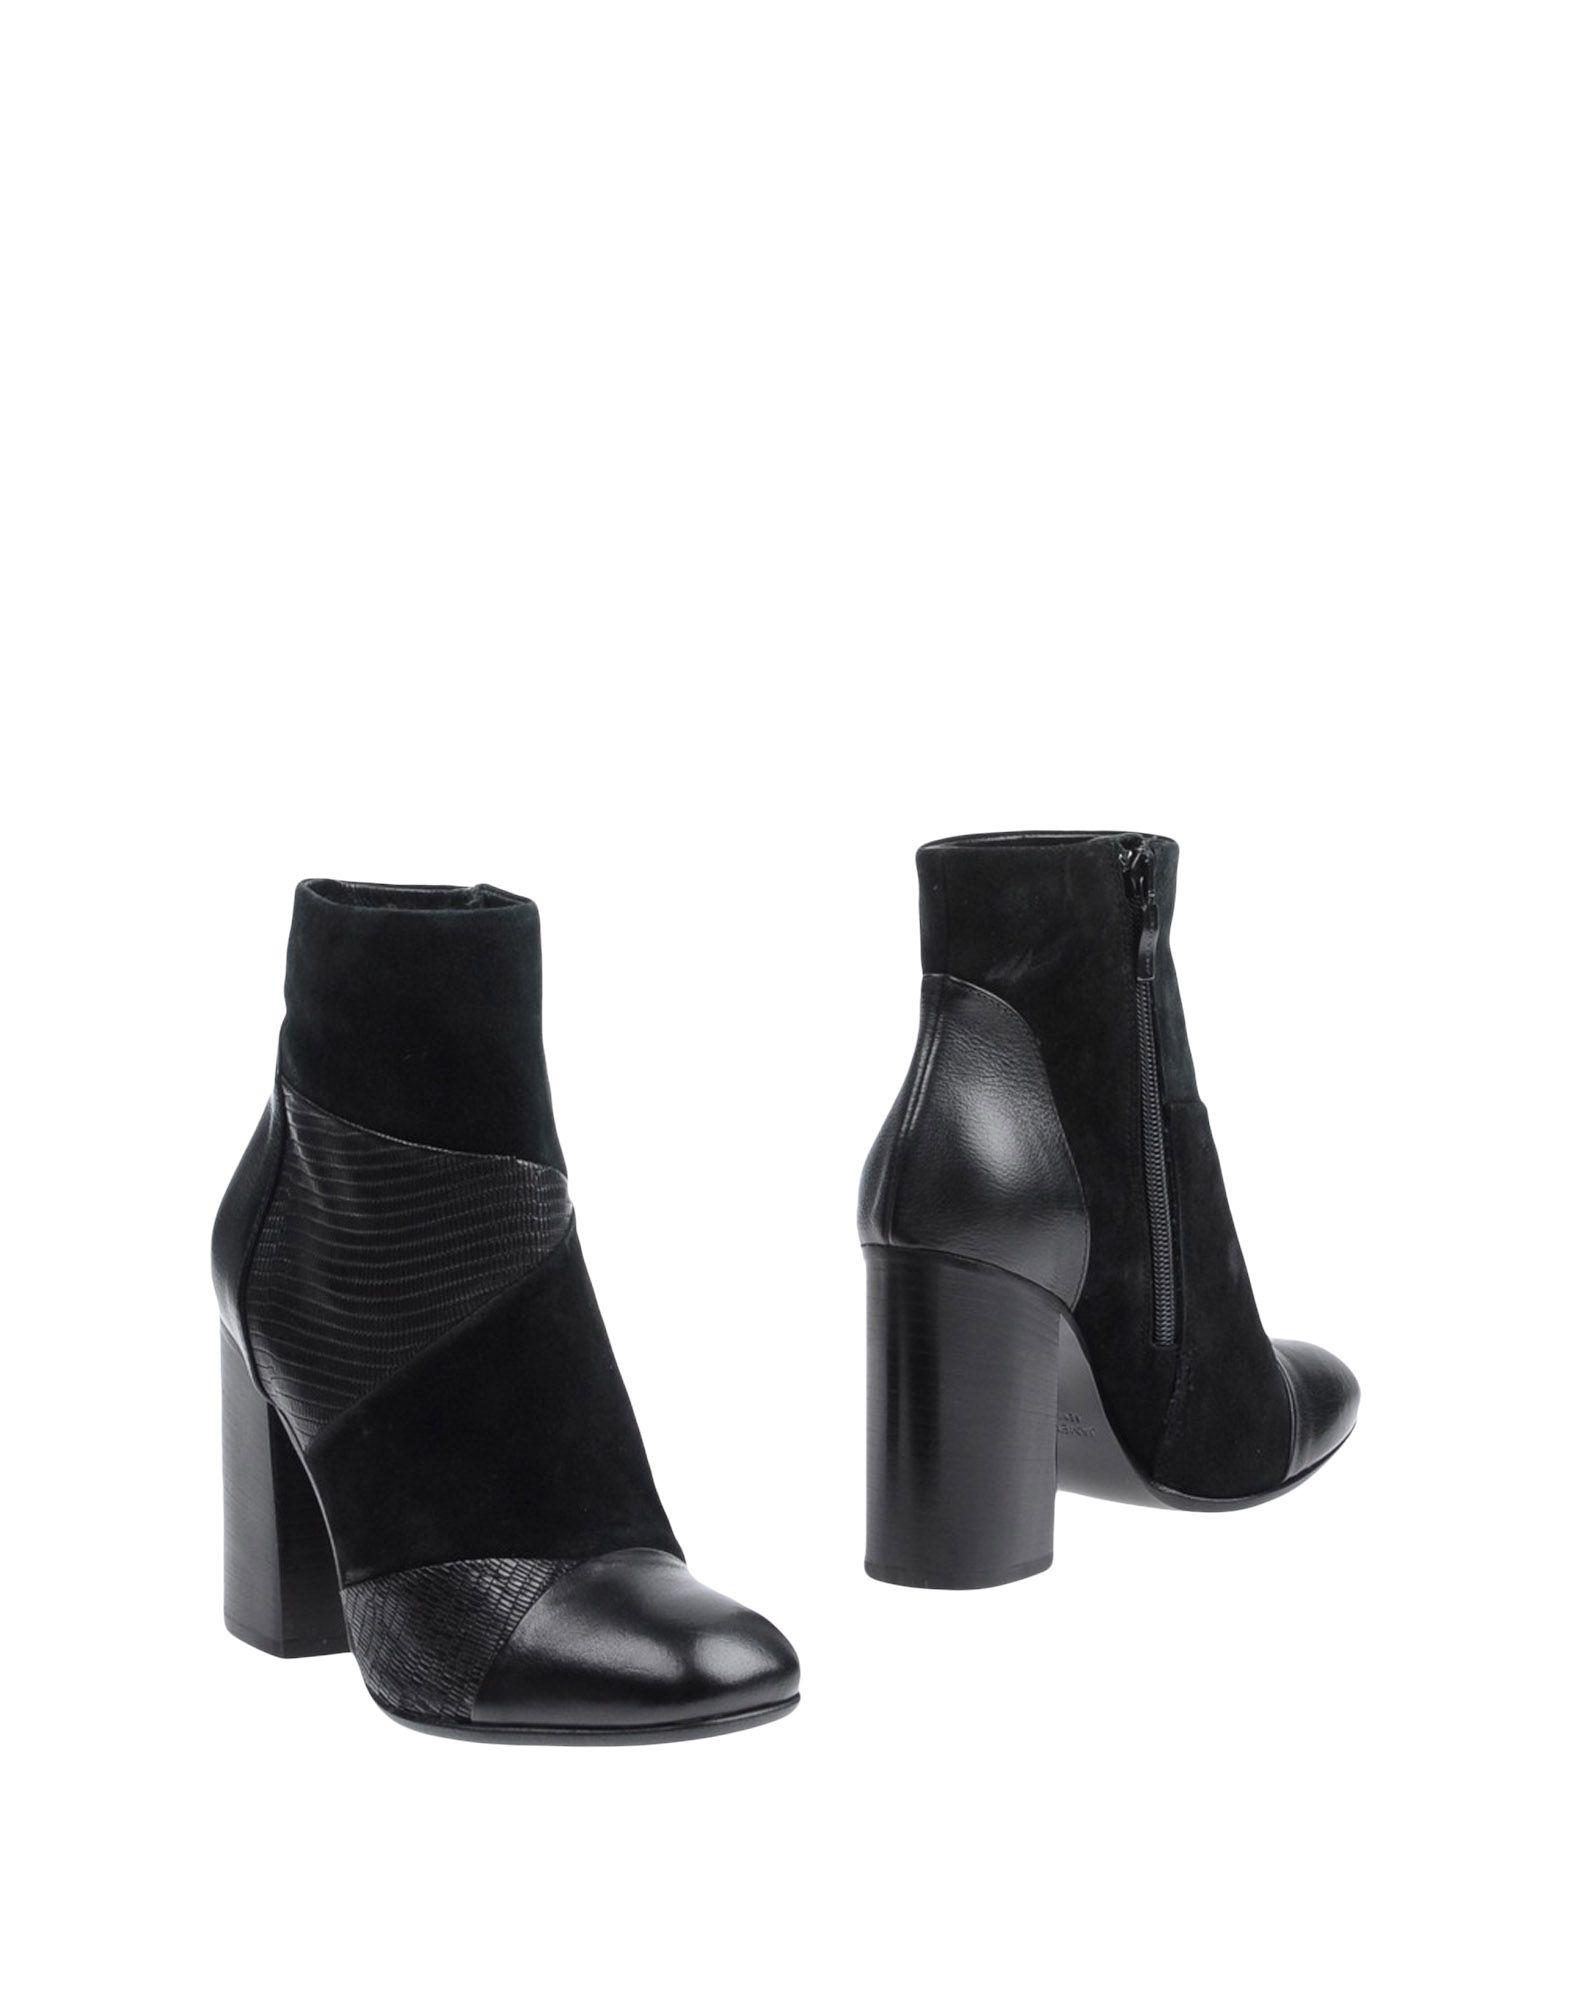 Stilvolle Janet billige Schuhe Janet & Janet Stilvolle Stiefelette Damen  11287865WB f21e93